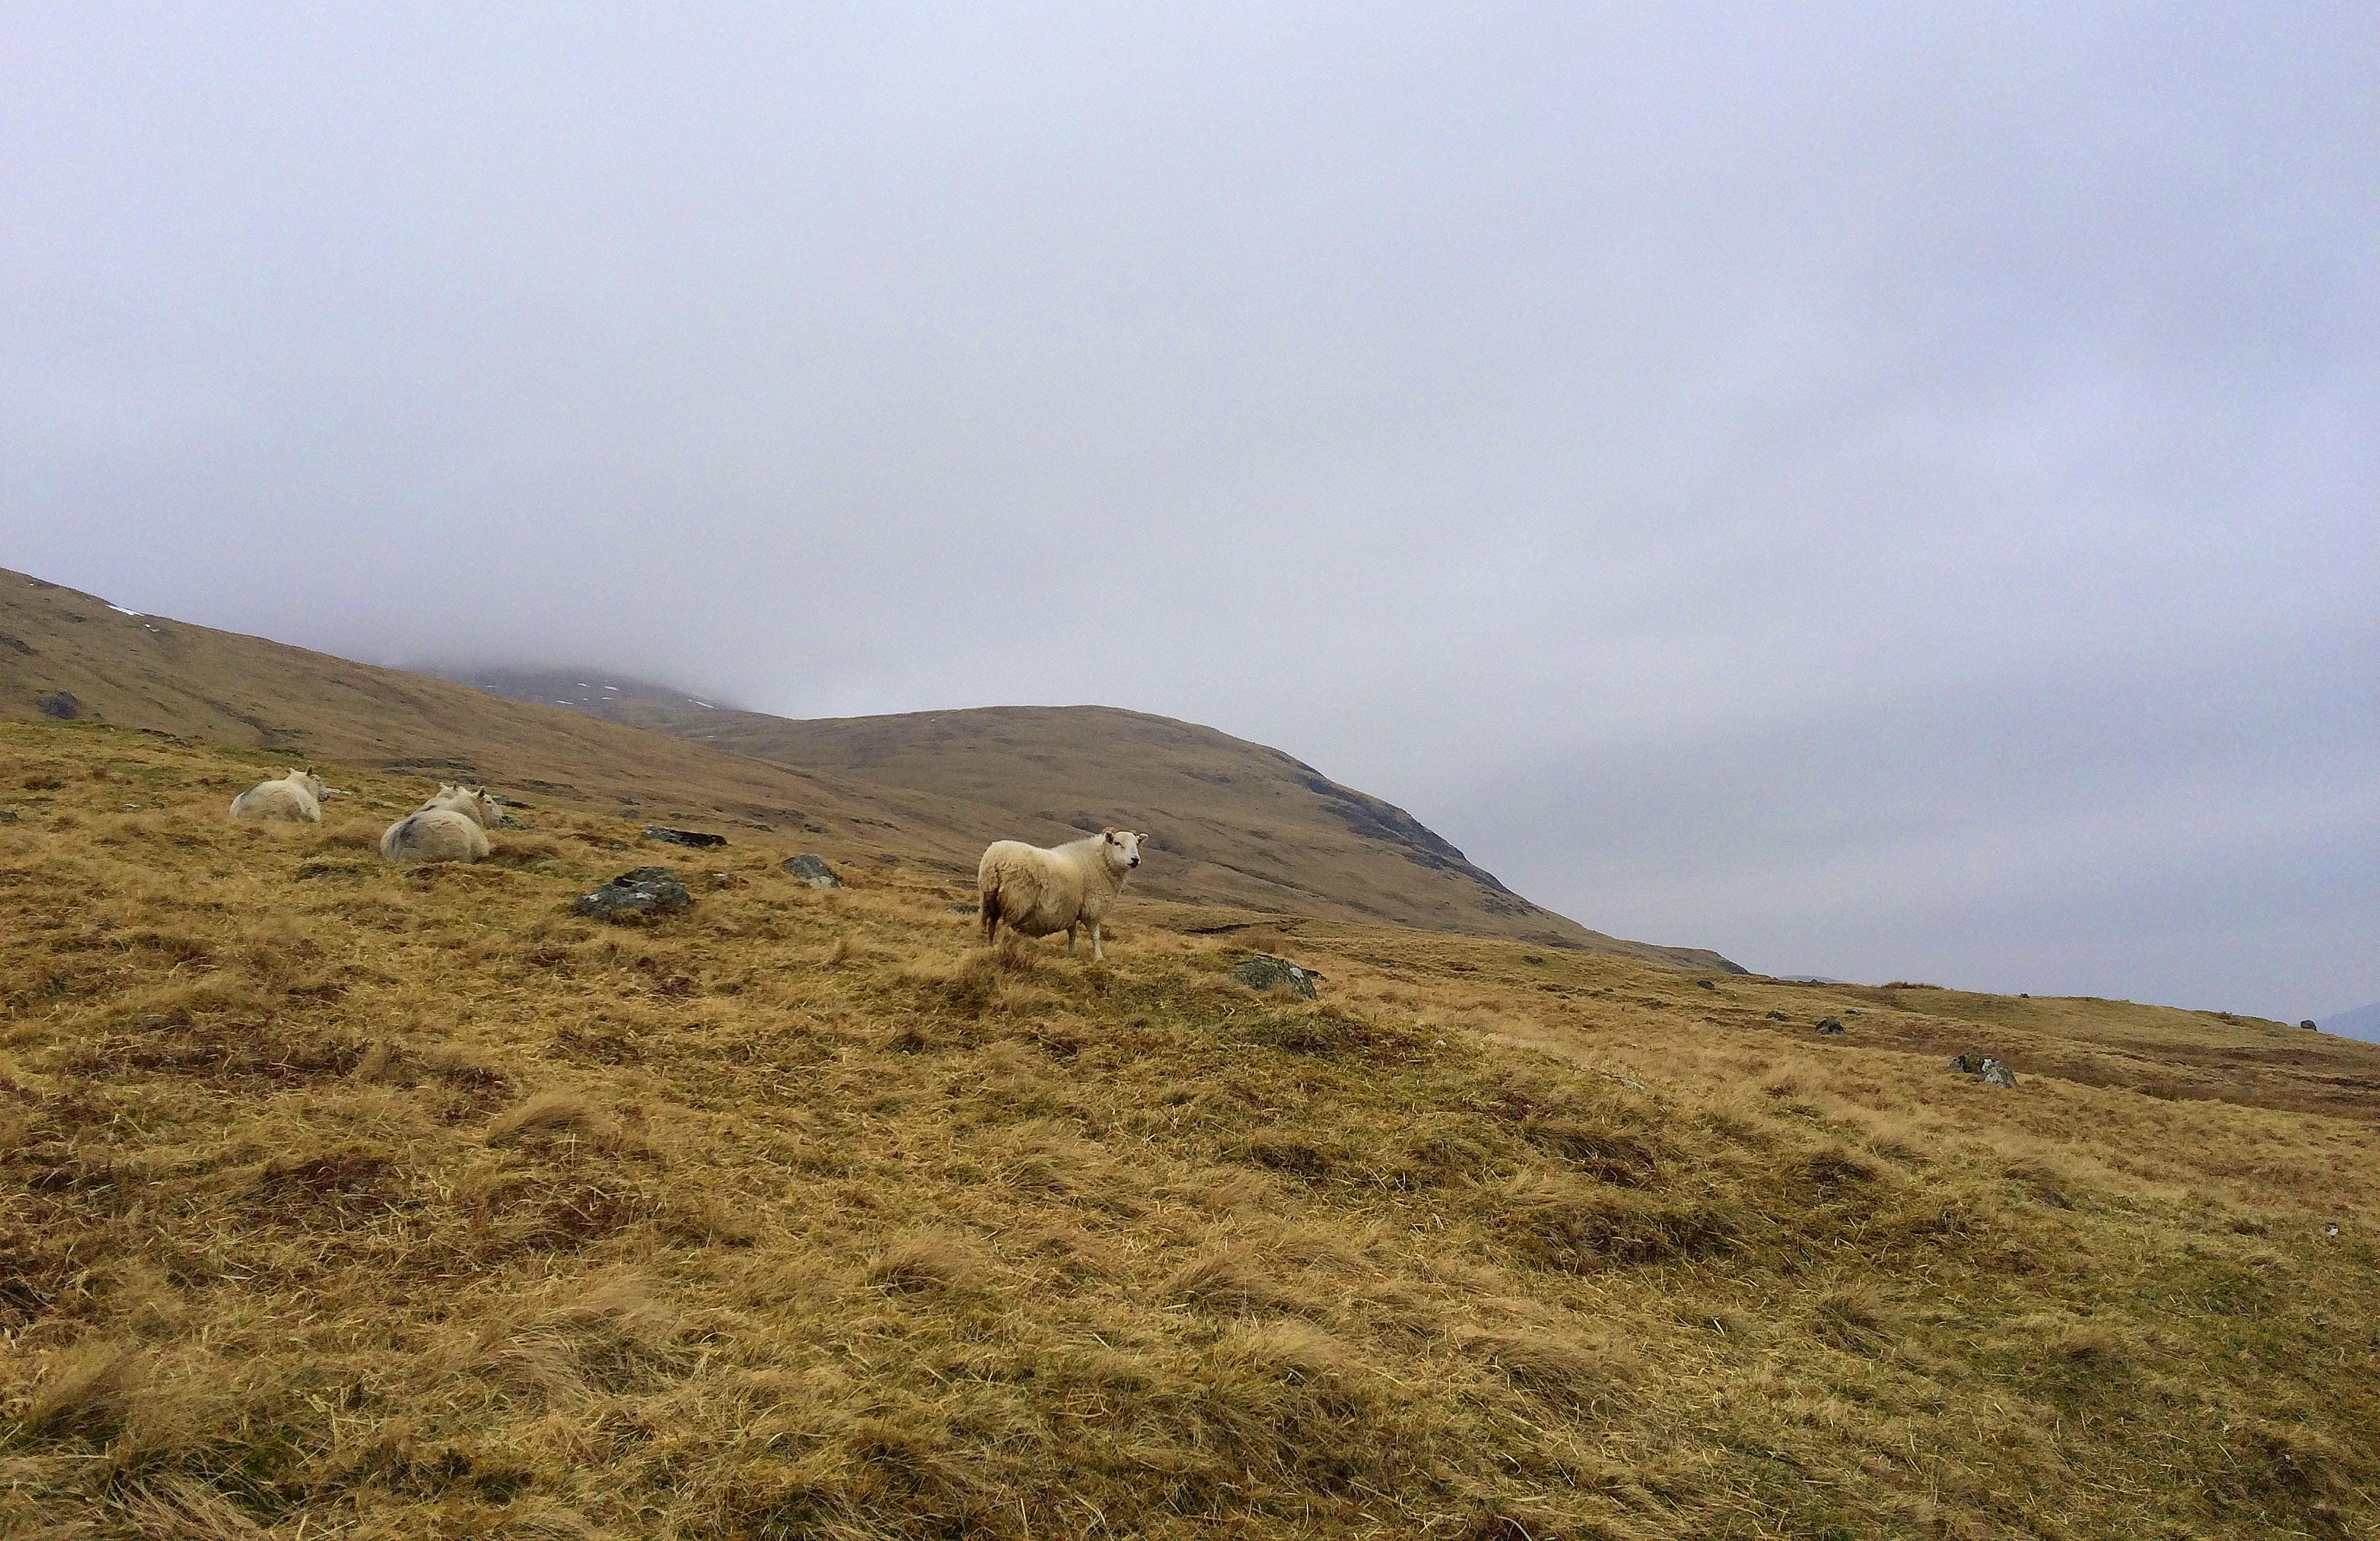 Sheep graze in a grassy hillside on a foggy day